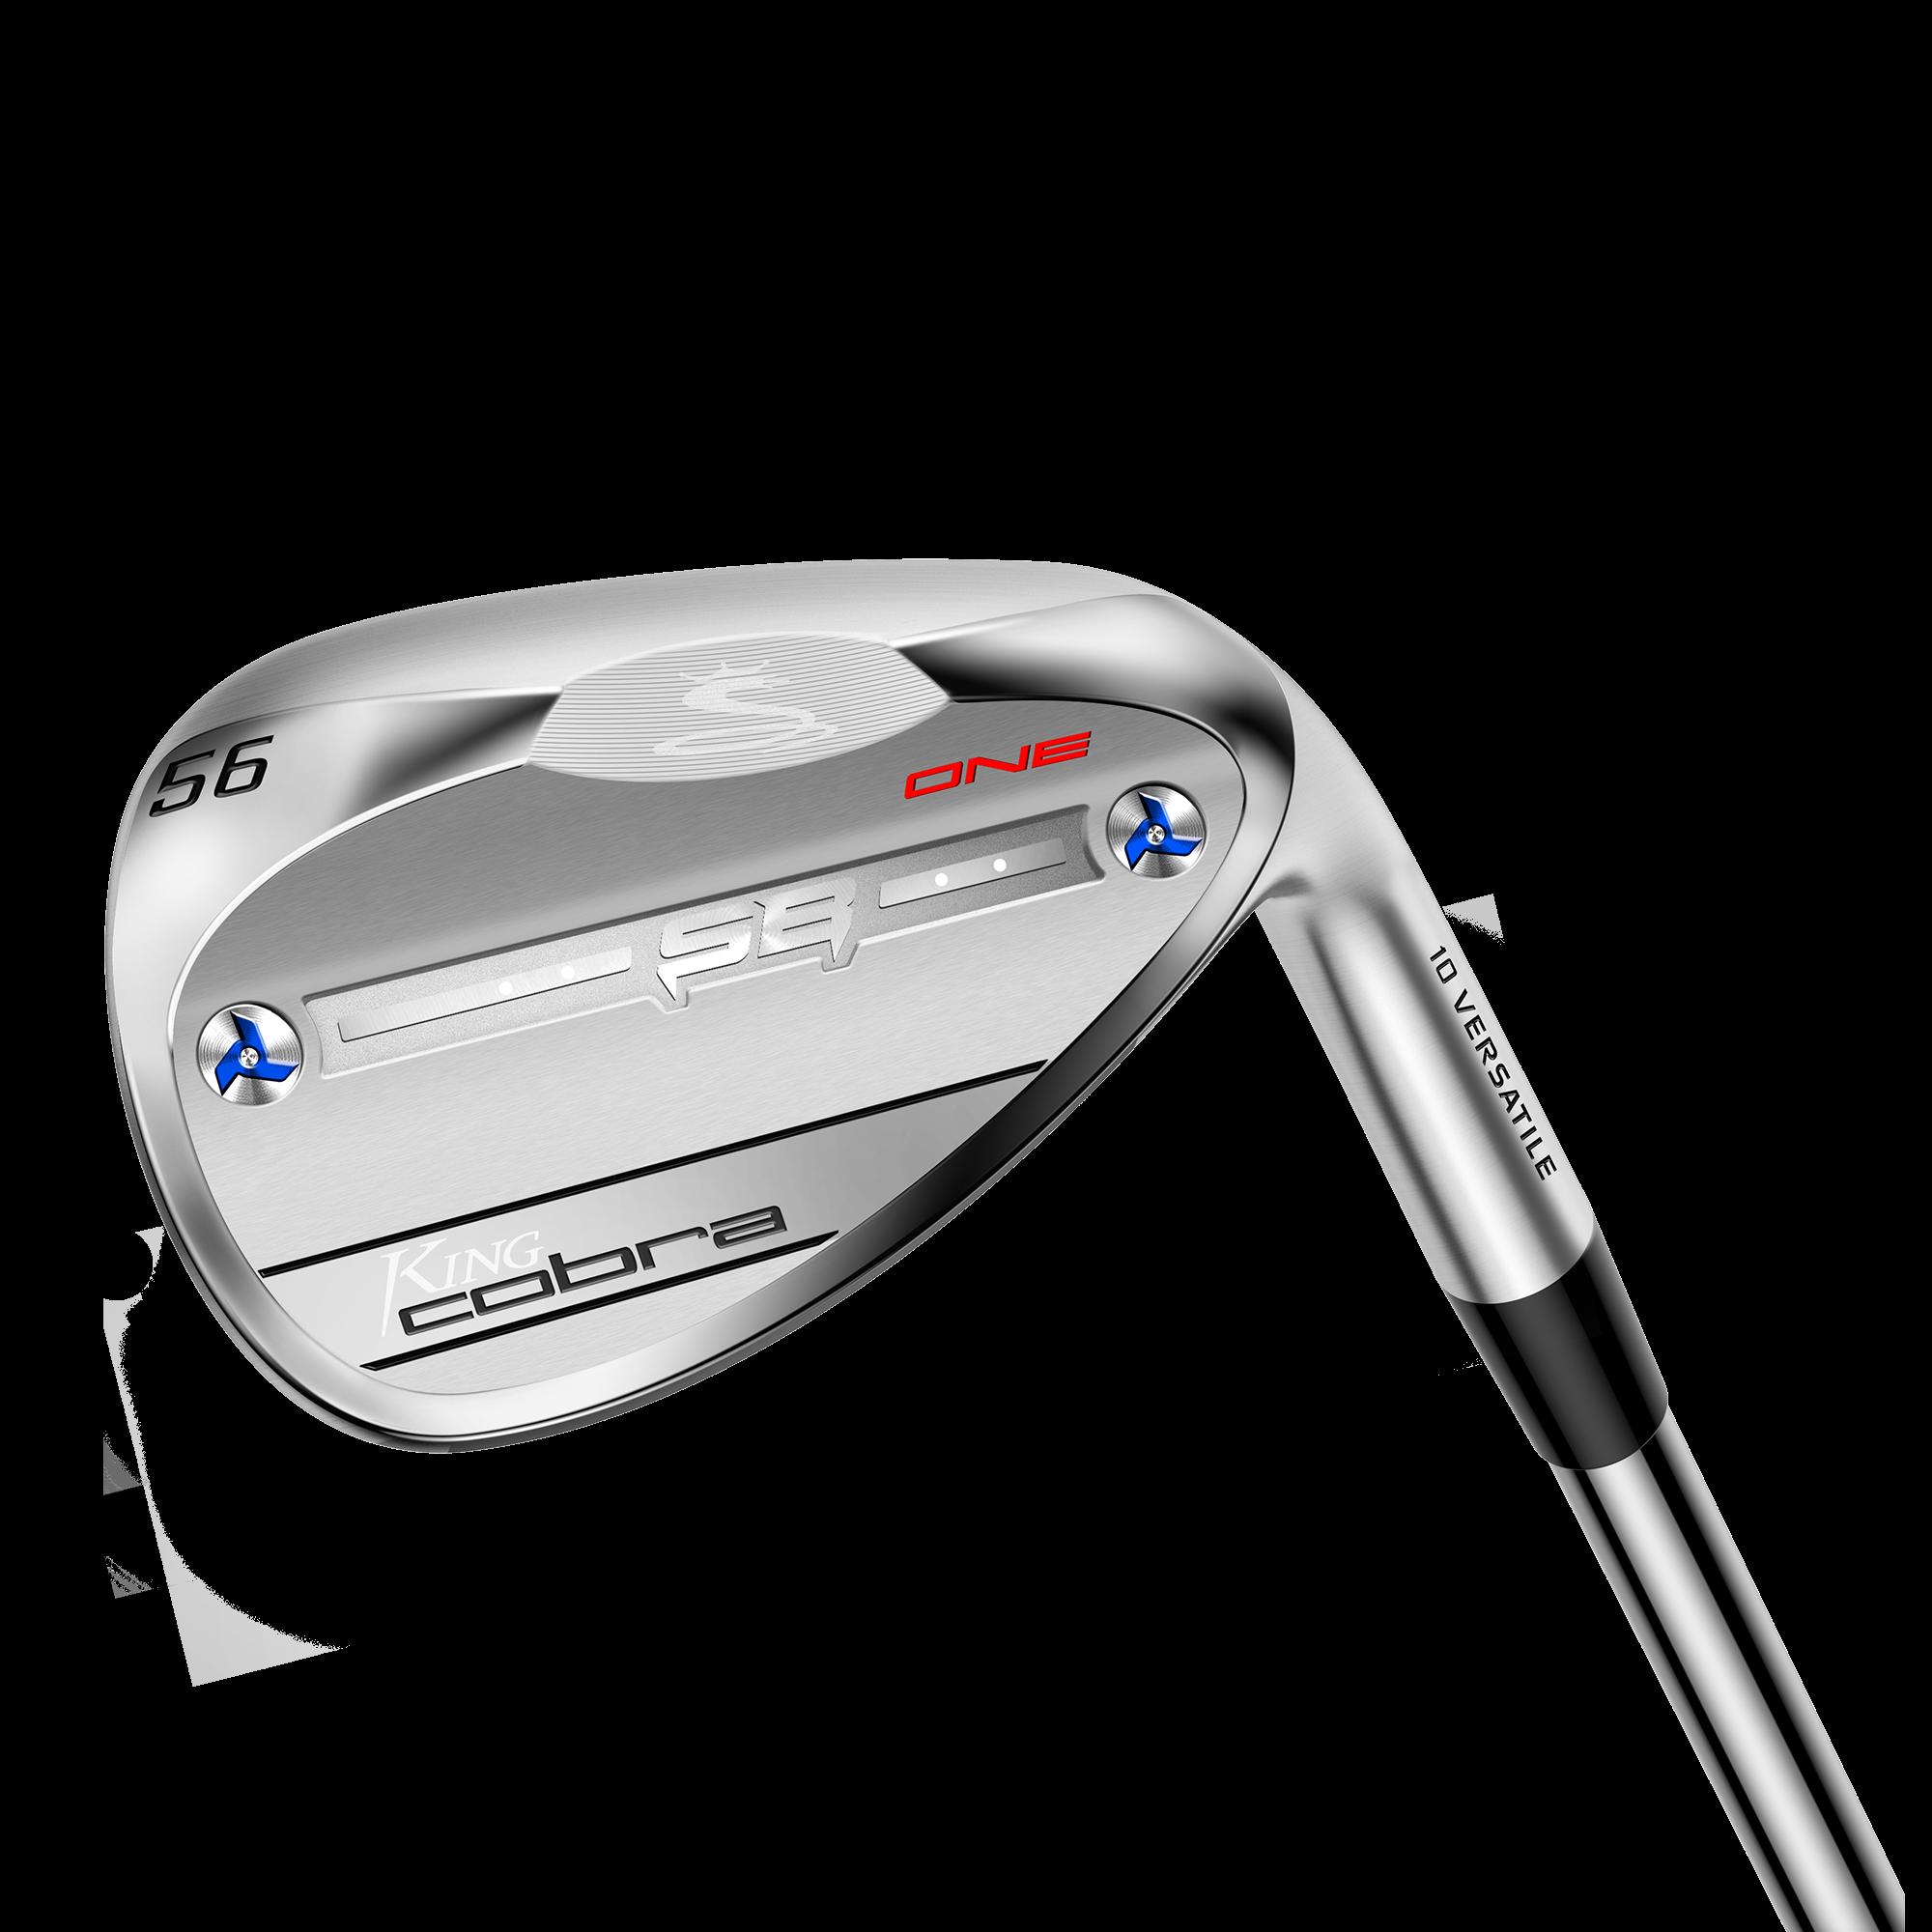 SNAKEBITE WEDGE - Trebo Golfshop